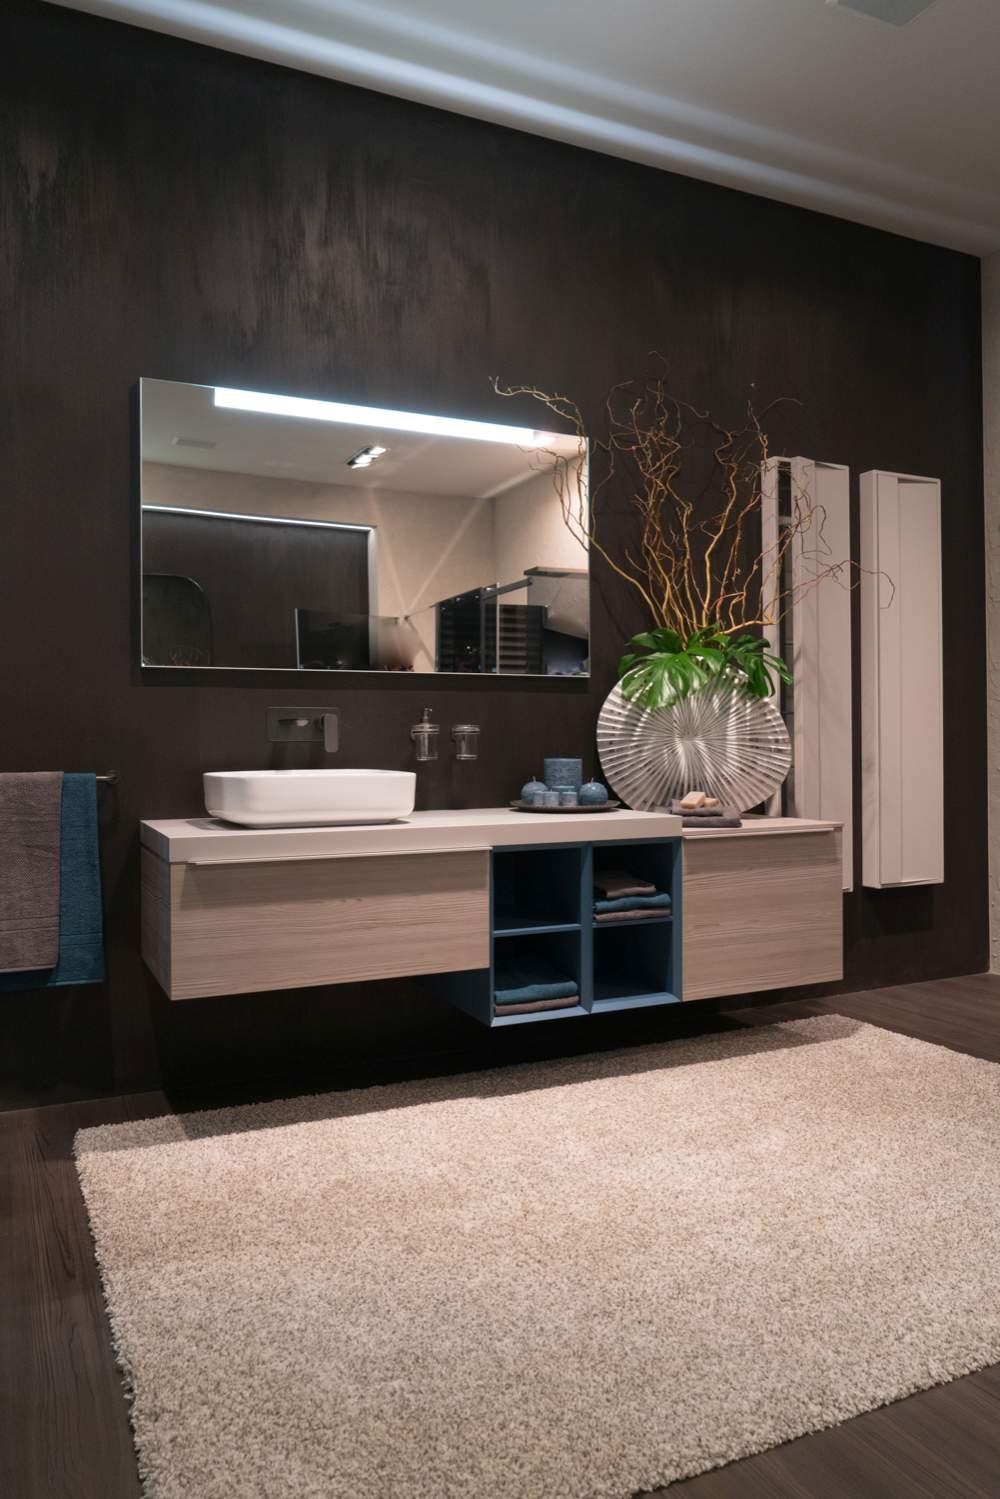 Rectangular large bathroom mirror